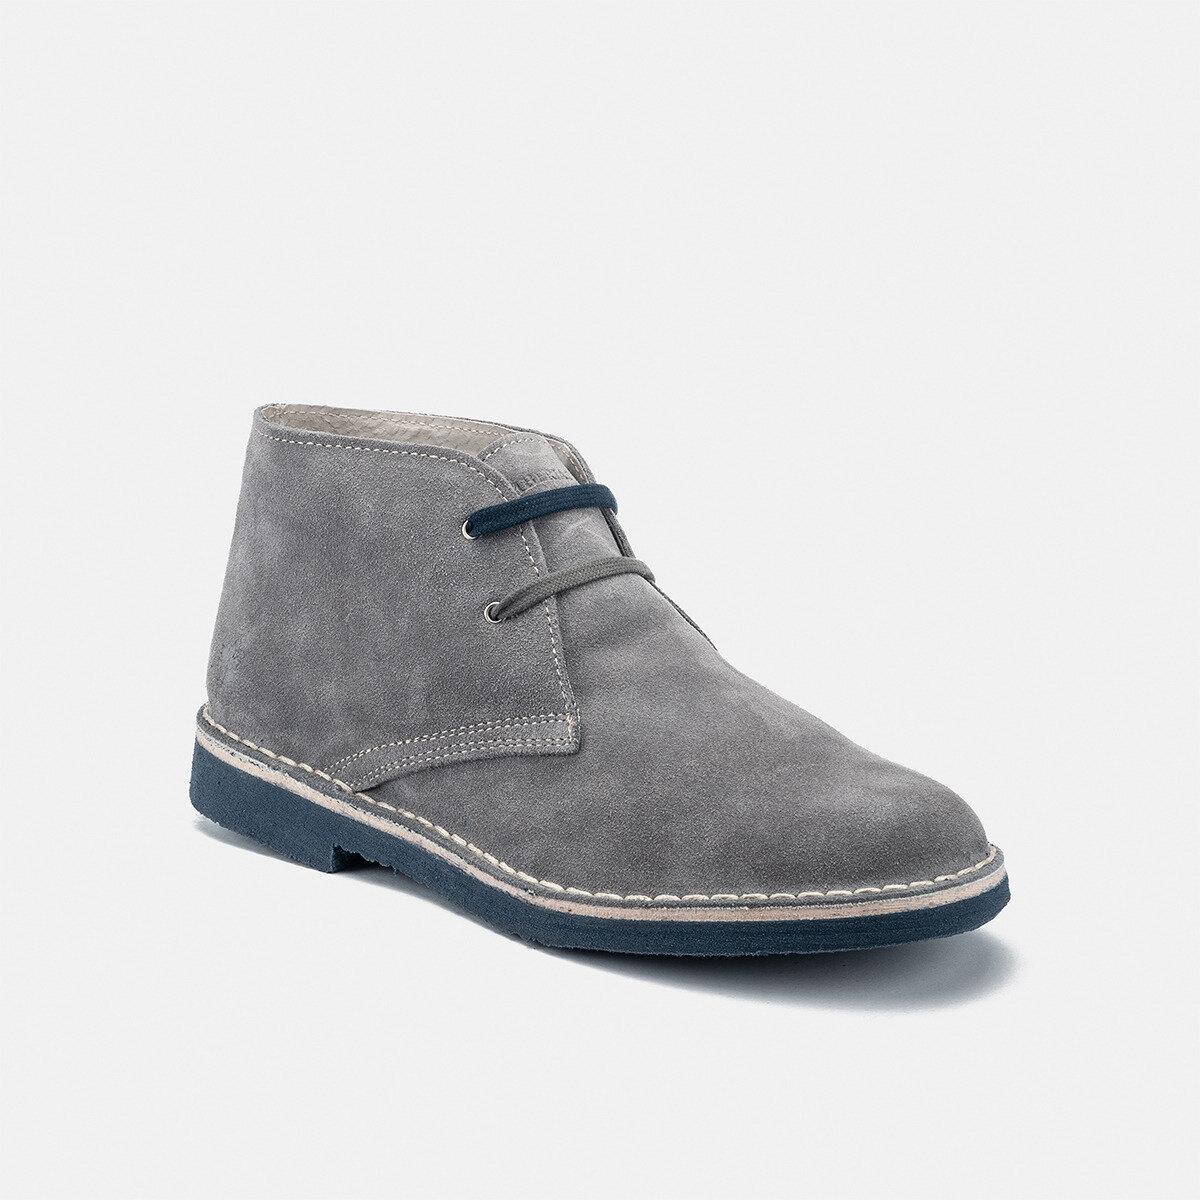 GABLE ASH GREY/AVIO Man Ankle boots